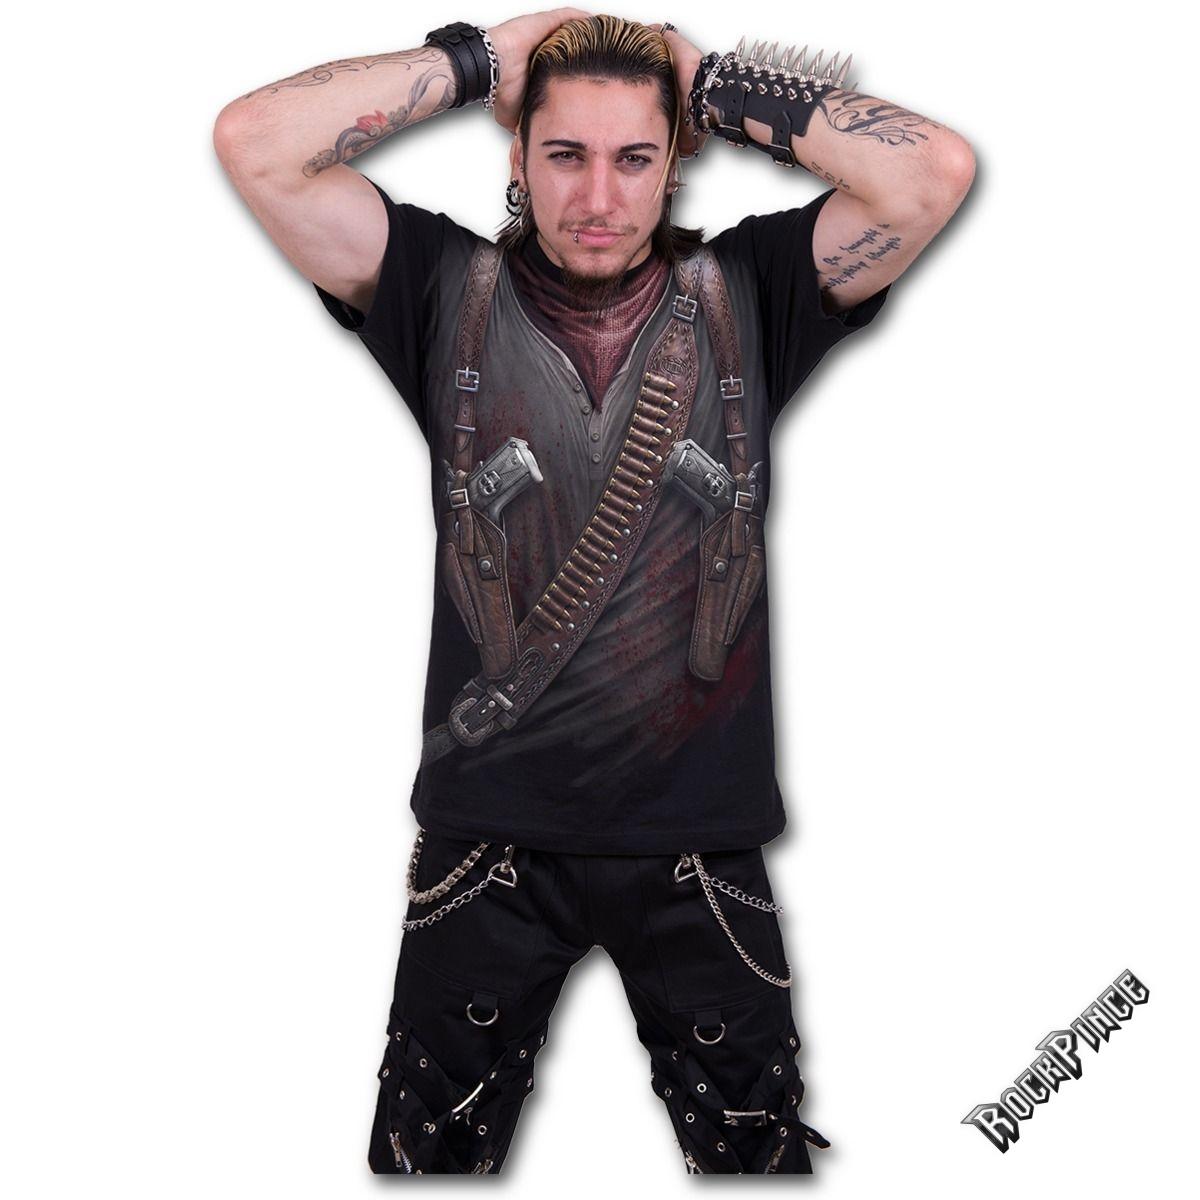 HOLSTER WRAP - Allover T-Shirt Black - W022M105